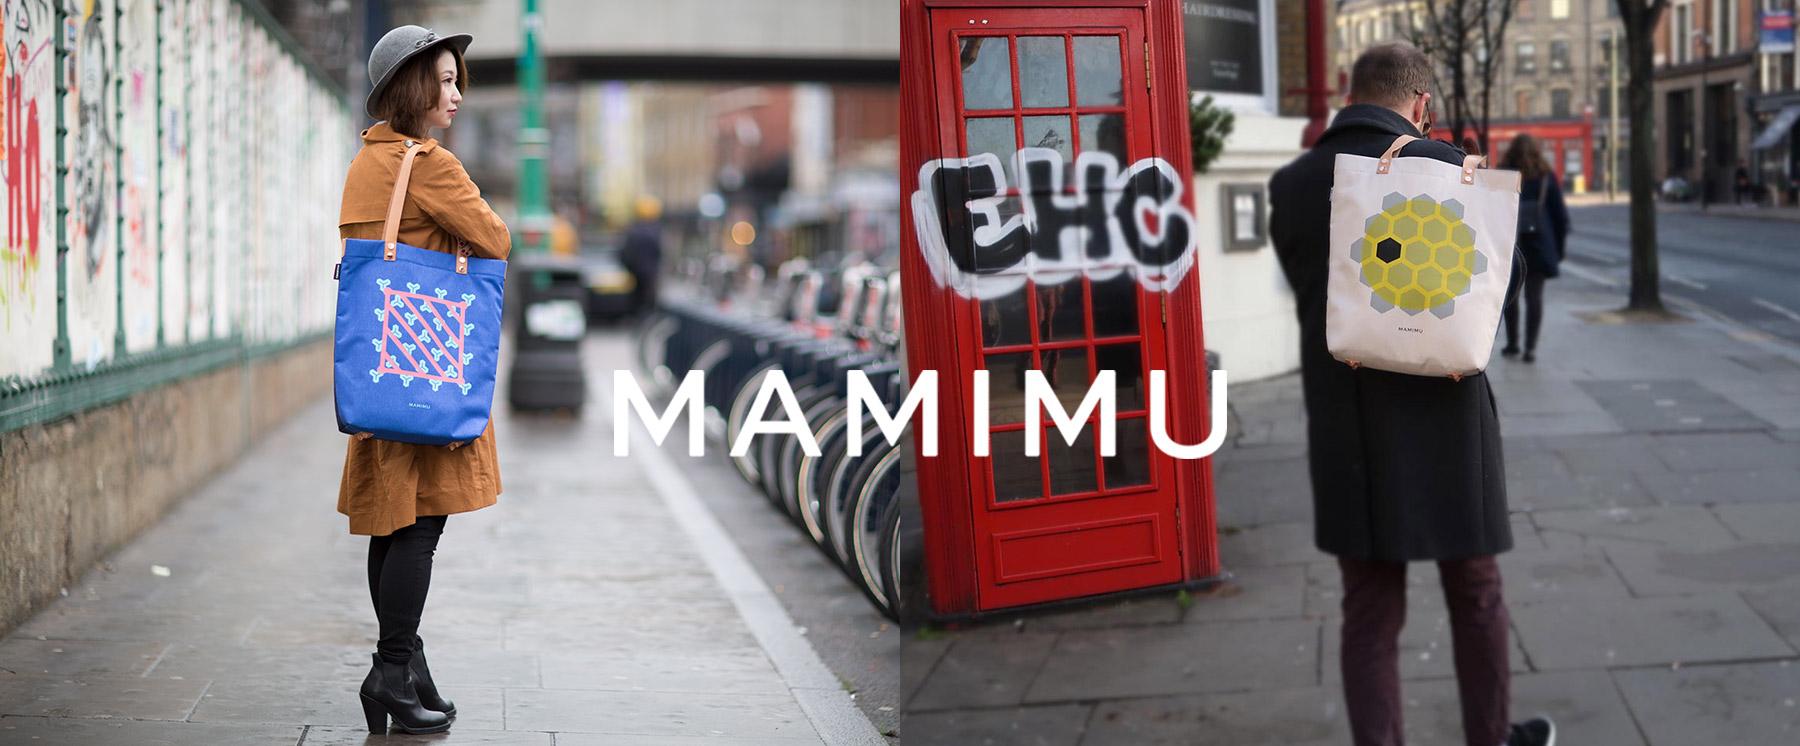 MAMIMU Tokyo: Japanese lifestyle brand for urban nomads